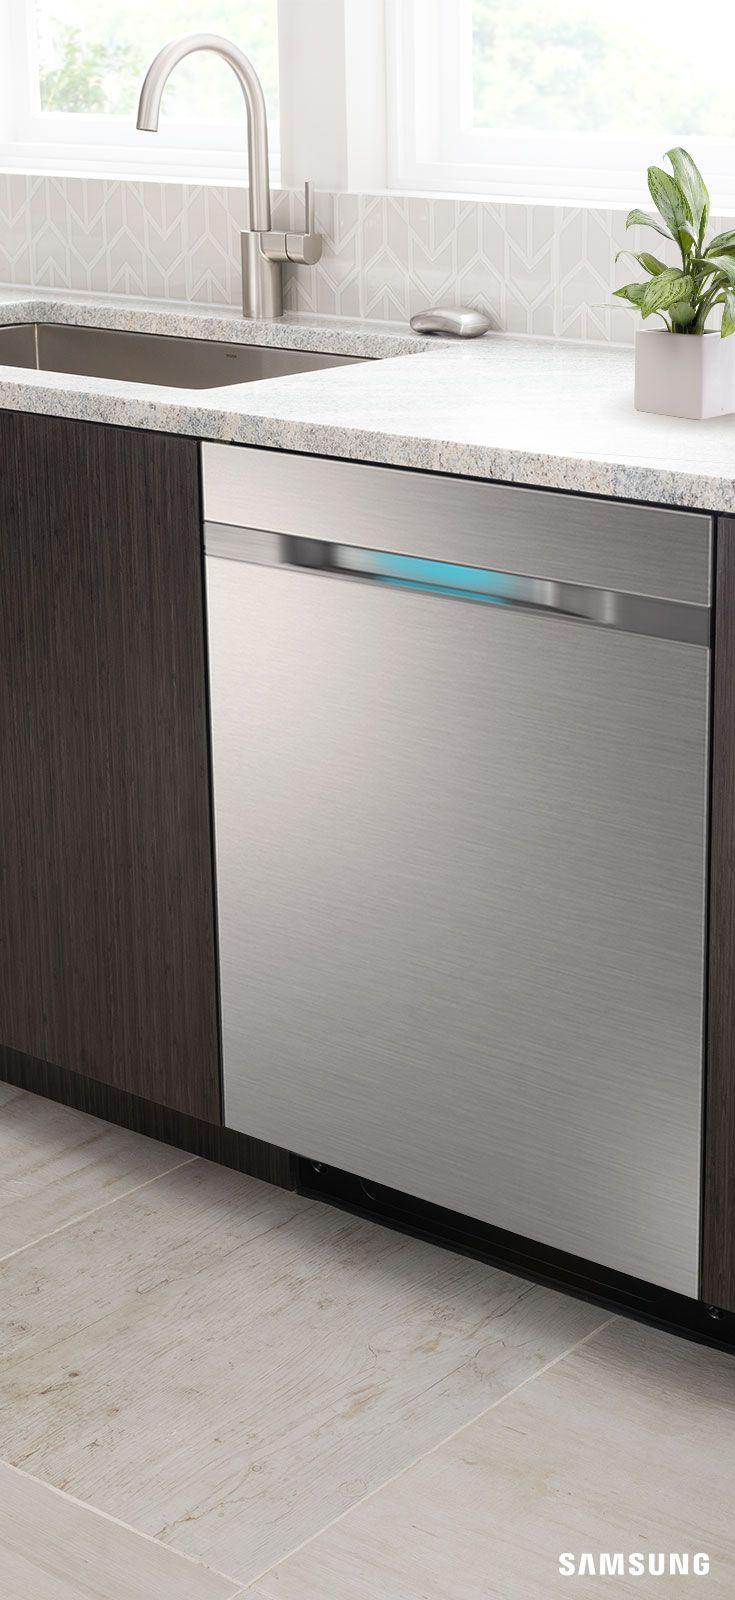 Top Control Dishwasher With Waterwall Technology Dishwashers Dw80j9945us Aa Samsung Us Kitchen Redesign Kitchen Design Samsung Appliances